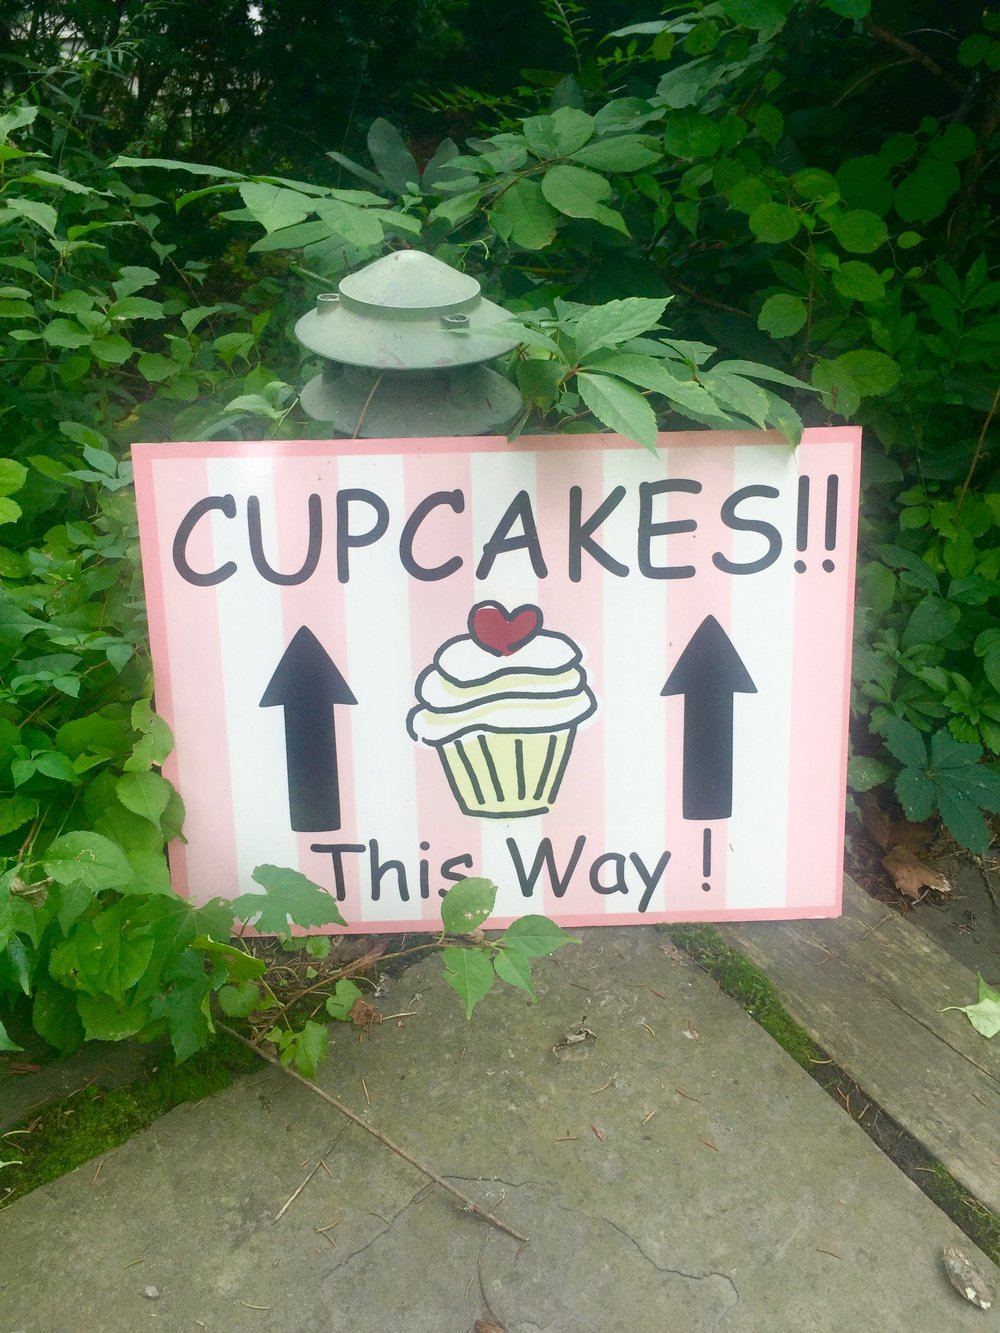 Peace, Love & Cupcakes in Woodstock, NY